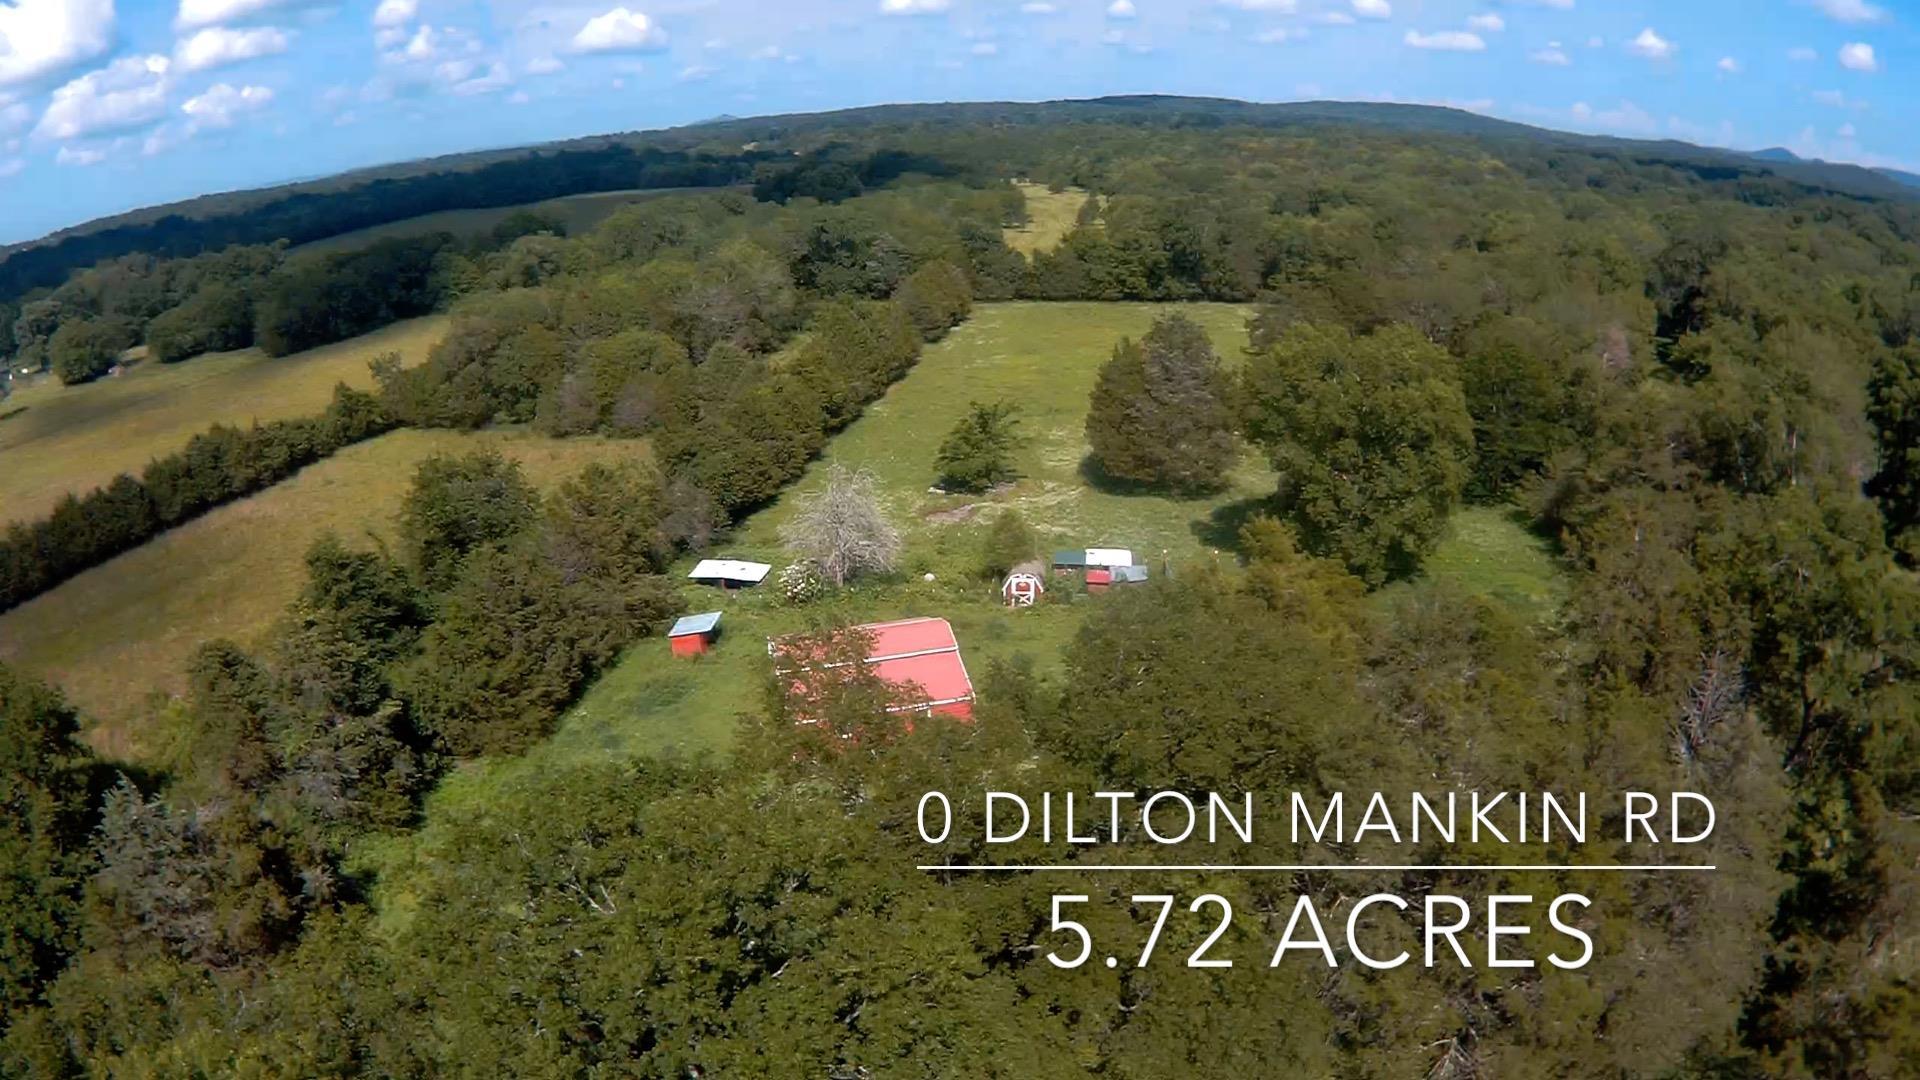 0 Dilton Mankin Rd, Murfreesboro, TN 37127